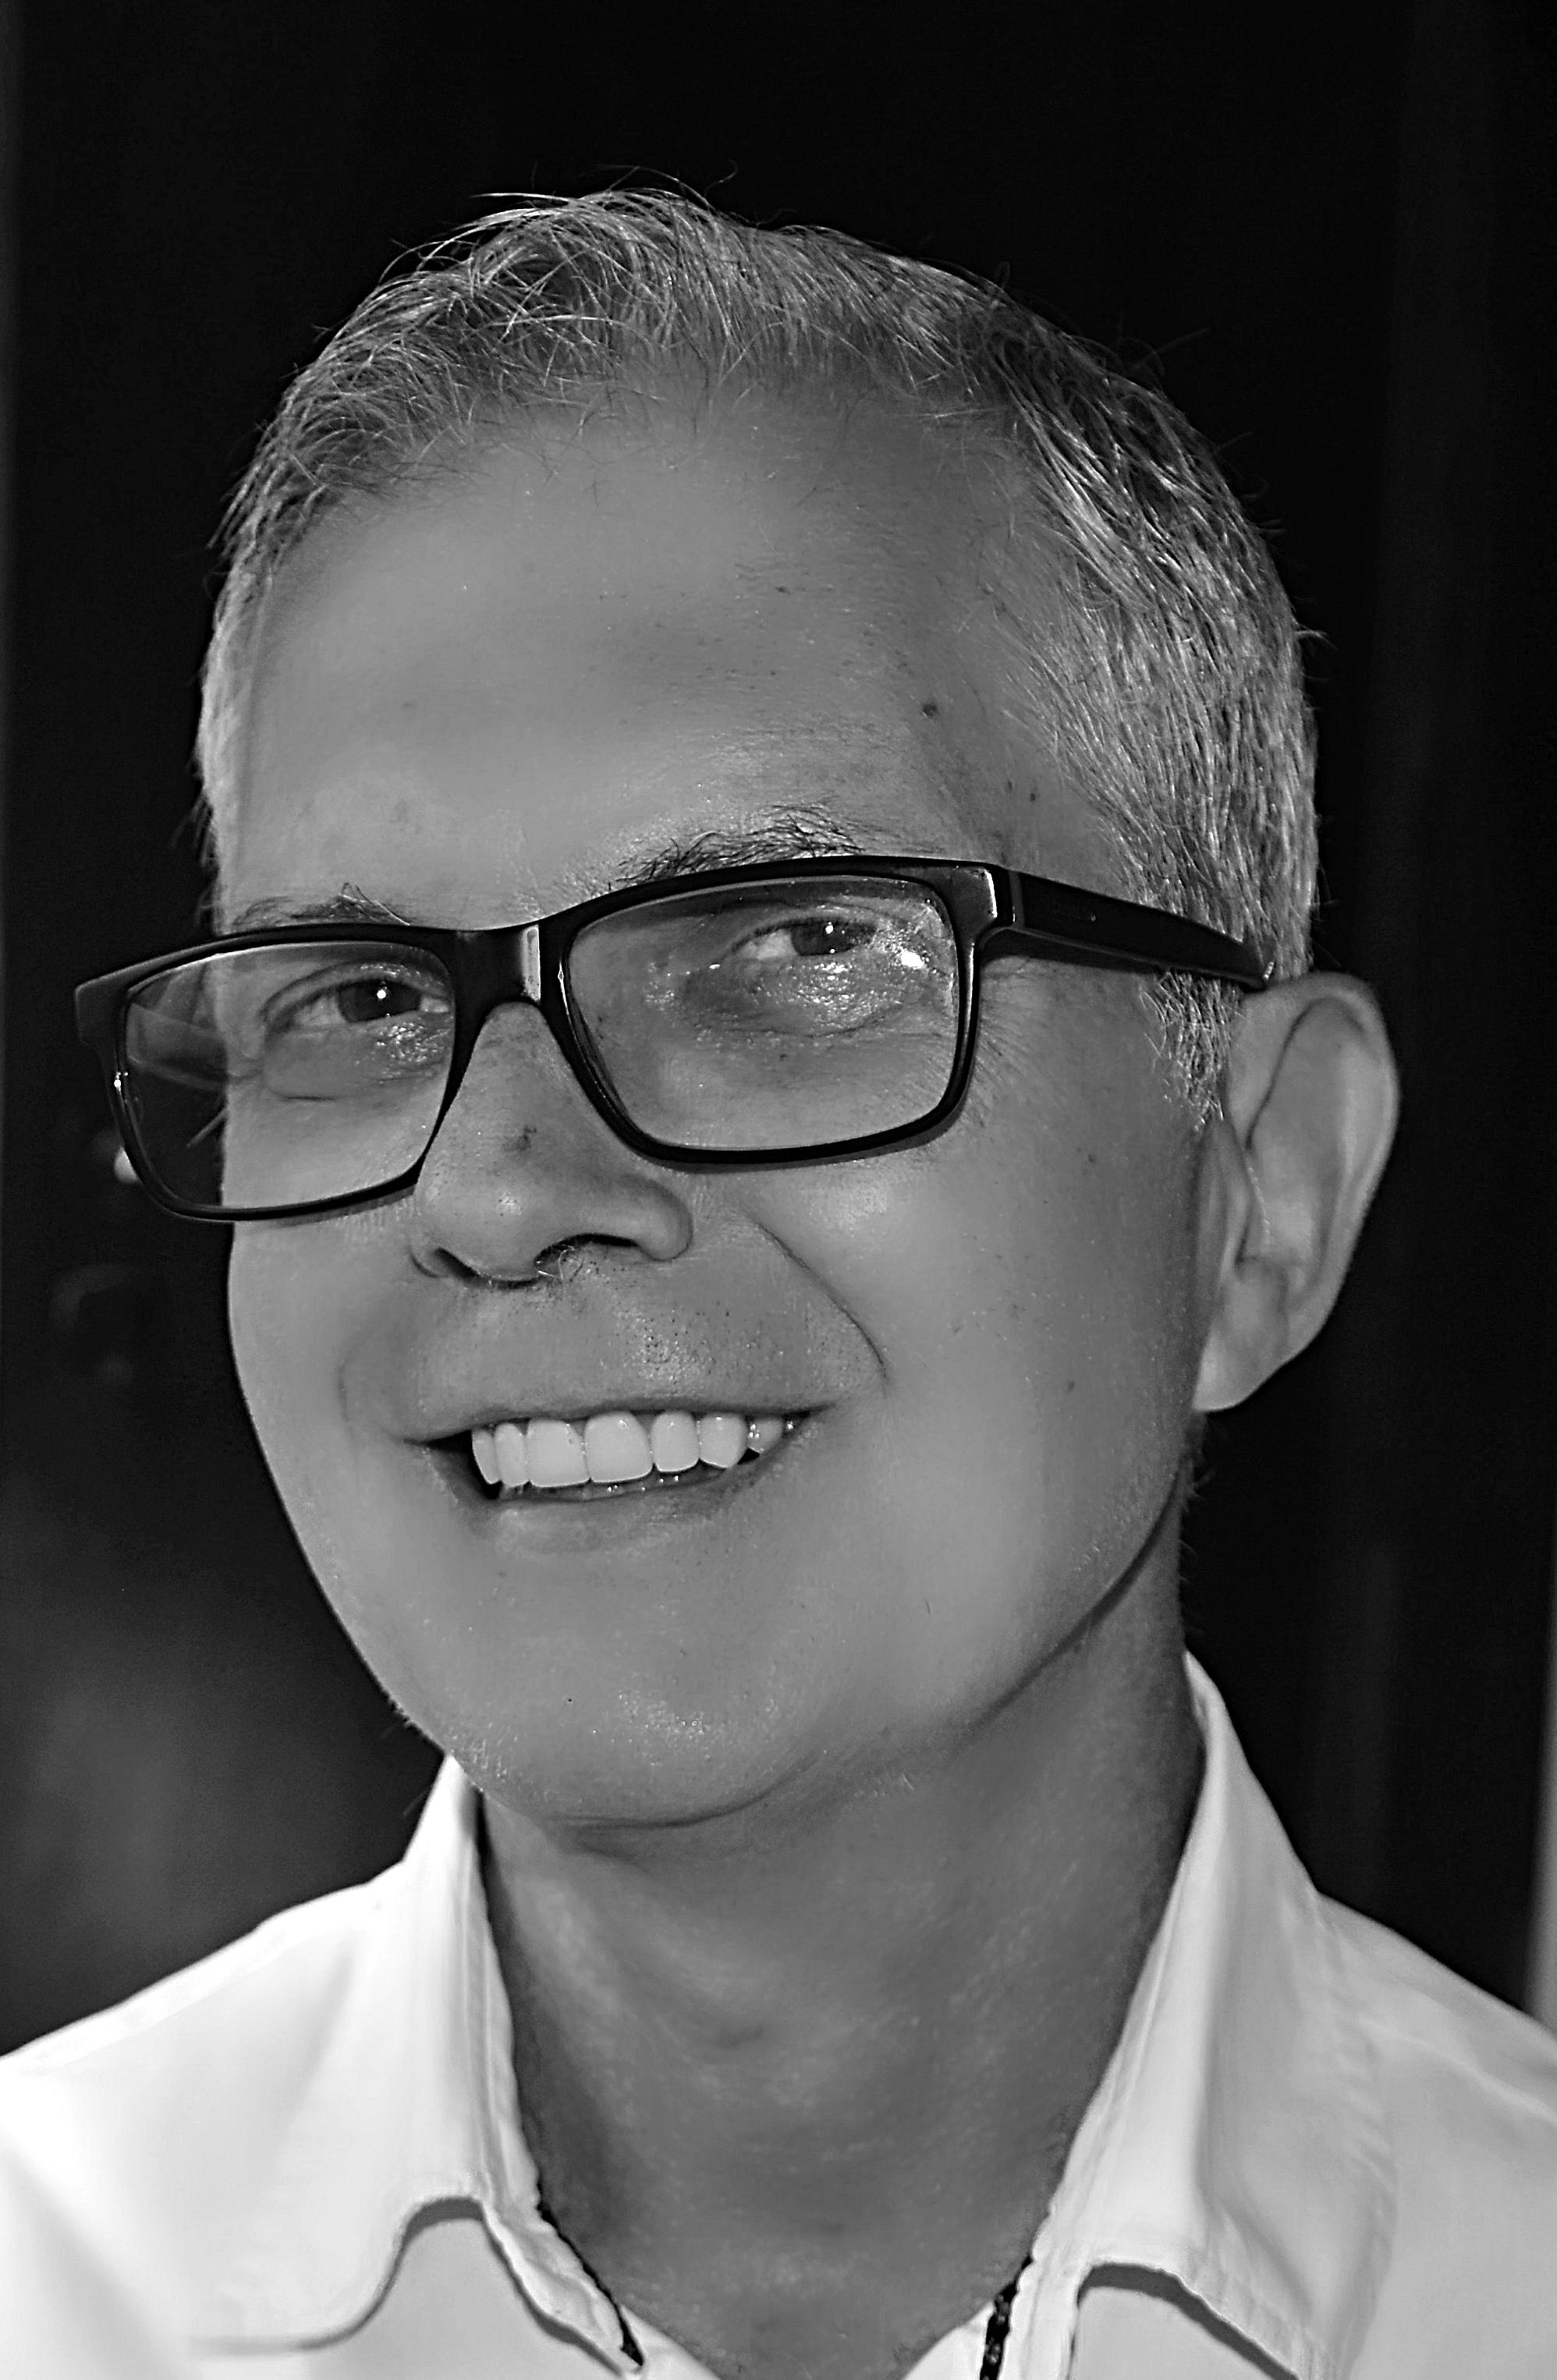 Entrevista – Luiz Augusto França – 24.04.2017